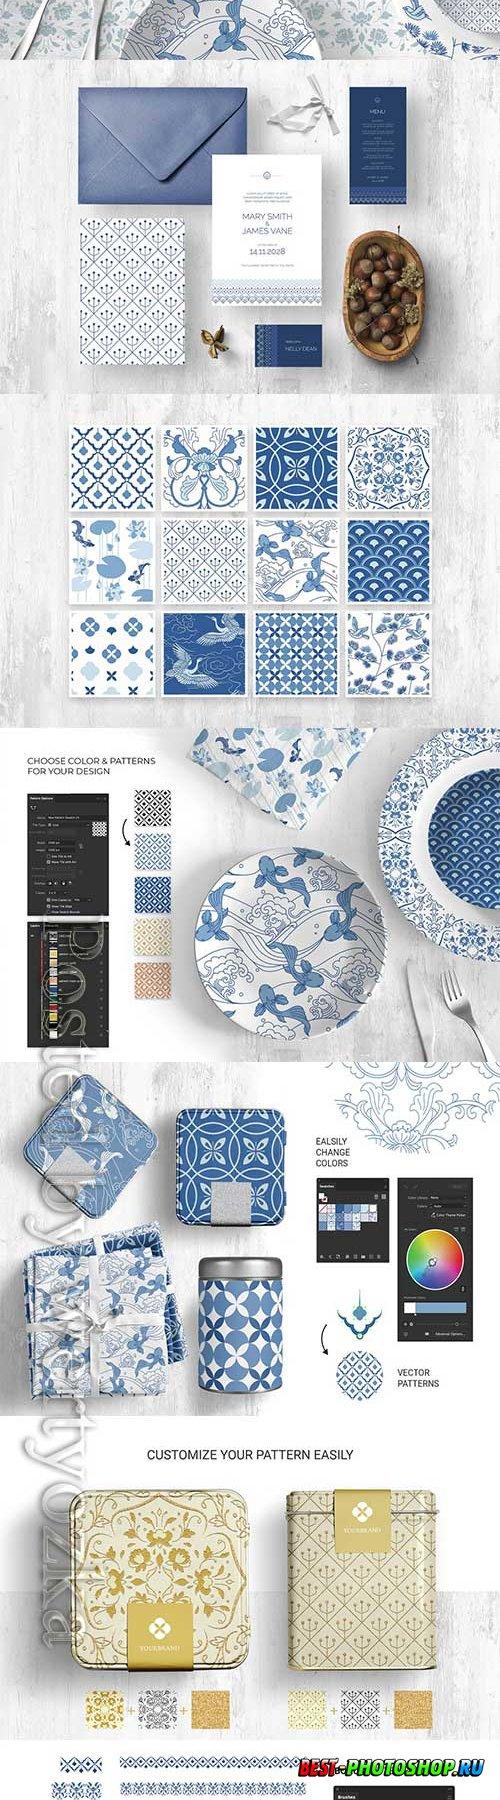 Chinese Ceramic Patterns